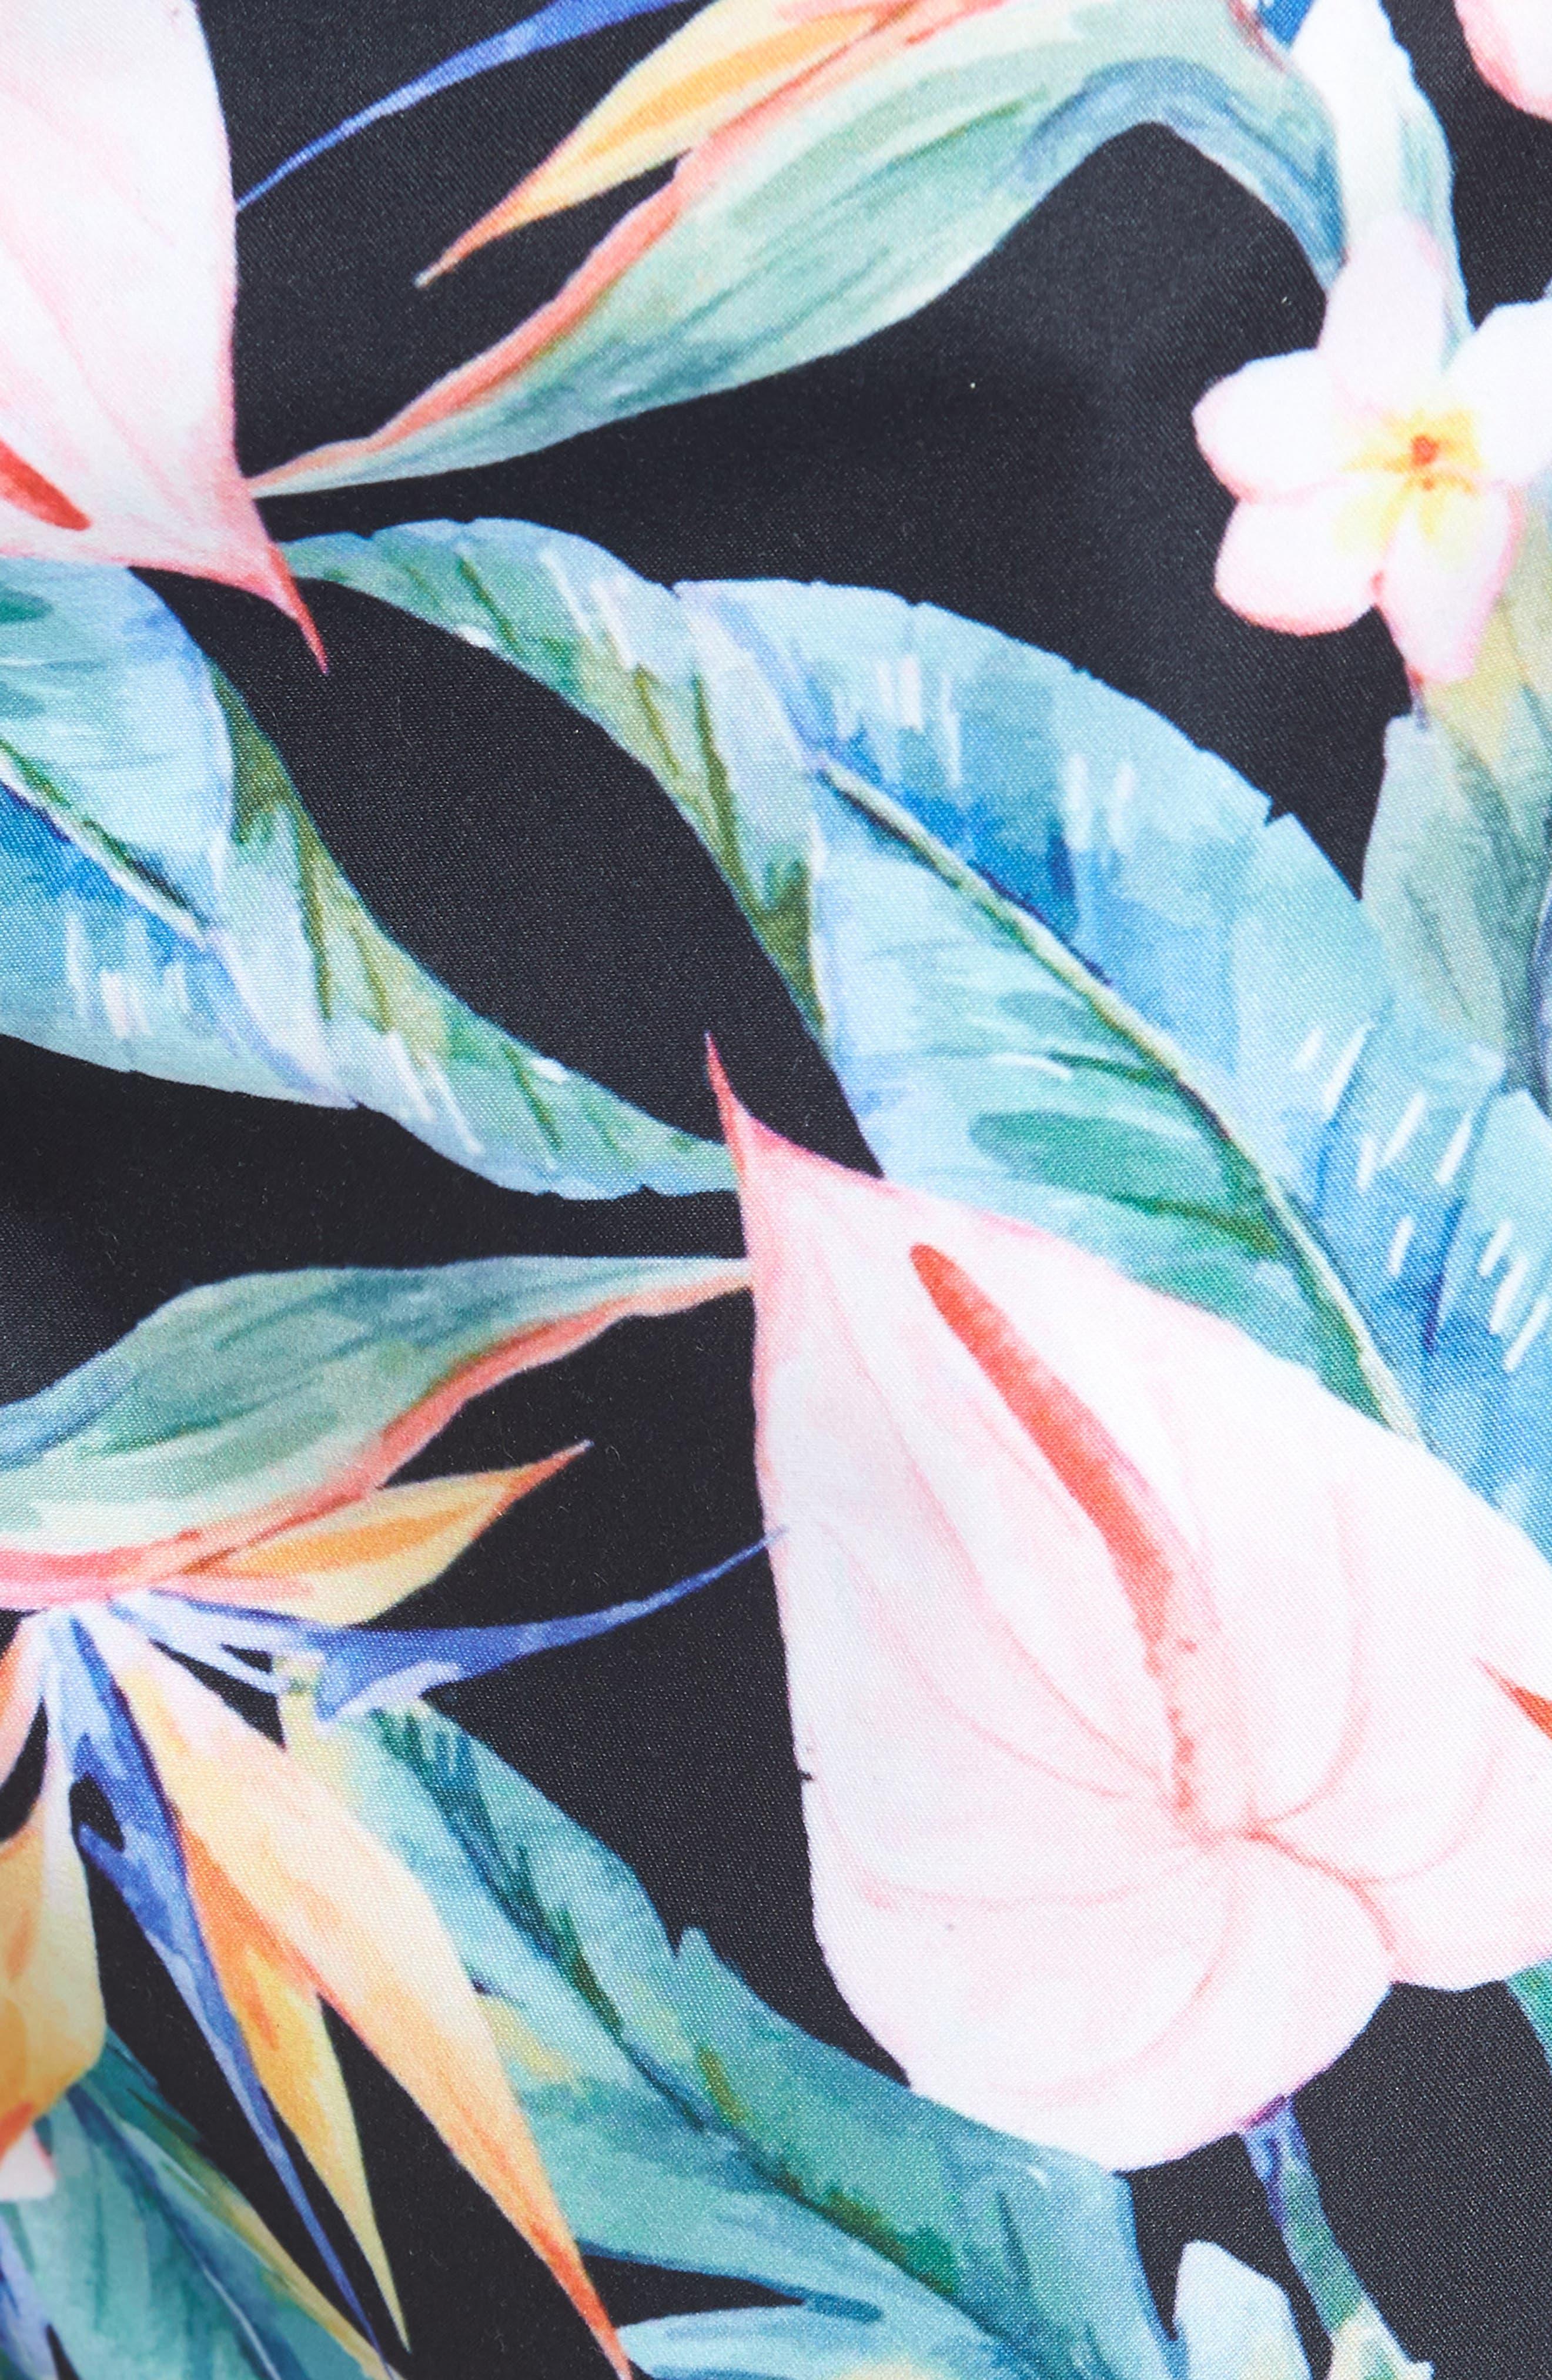 Floral Print Swim Trunks,                             Alternate thumbnail 5, color,                             400